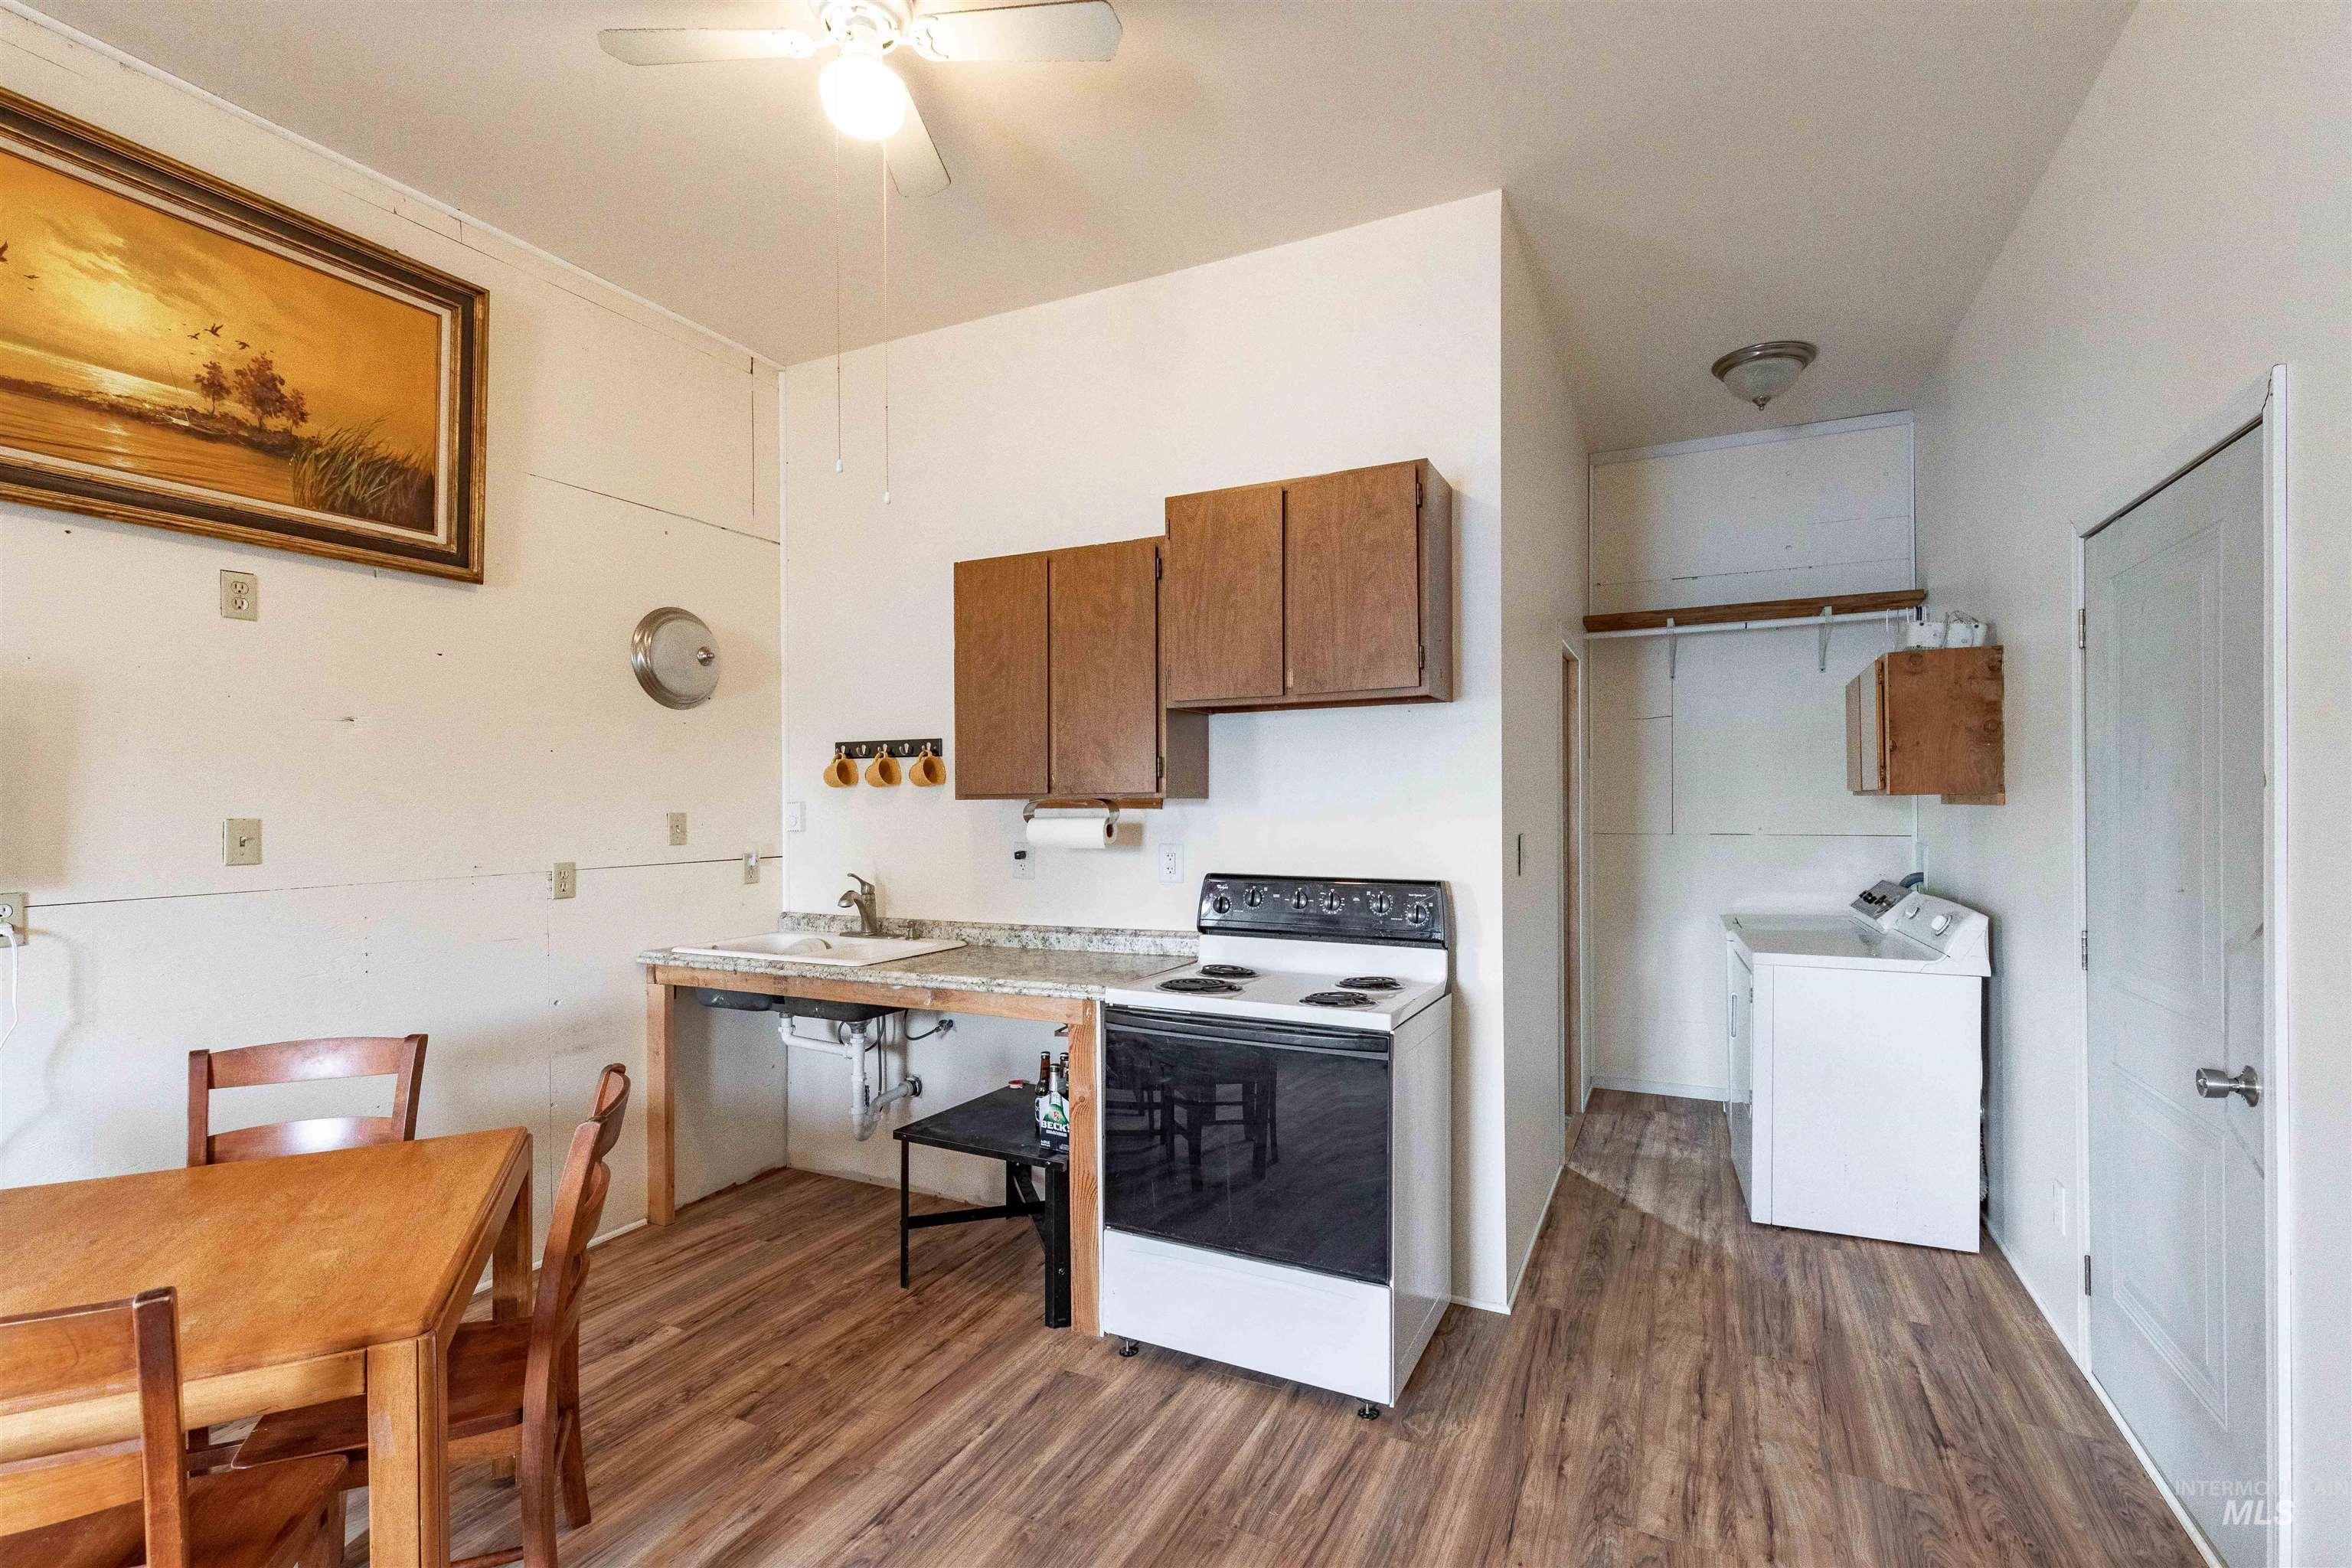 346 N Jackson Property Photo 31